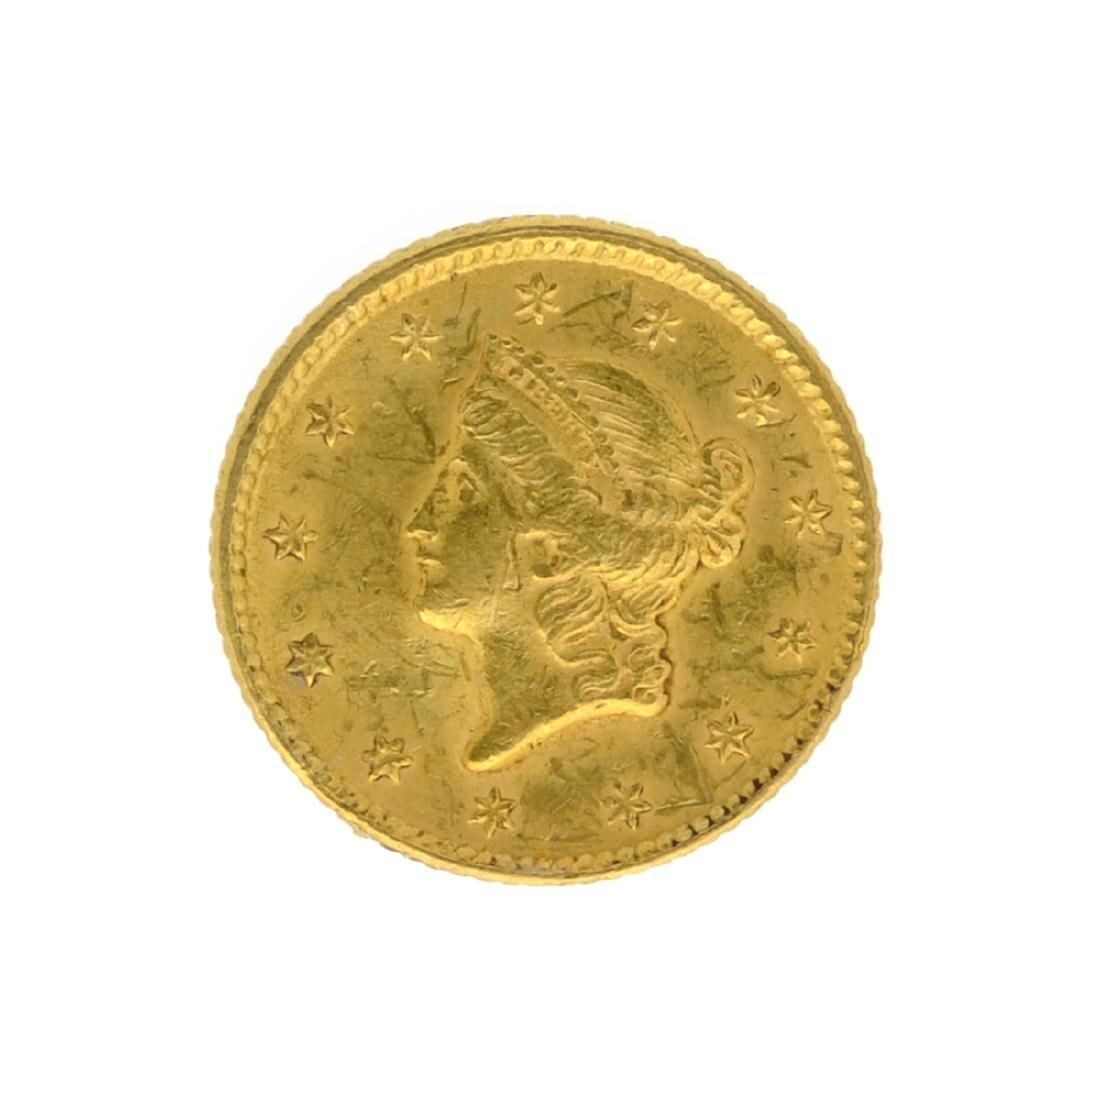 *1851 $1 U.S. Liberty Head Gold Coin (JG-N)